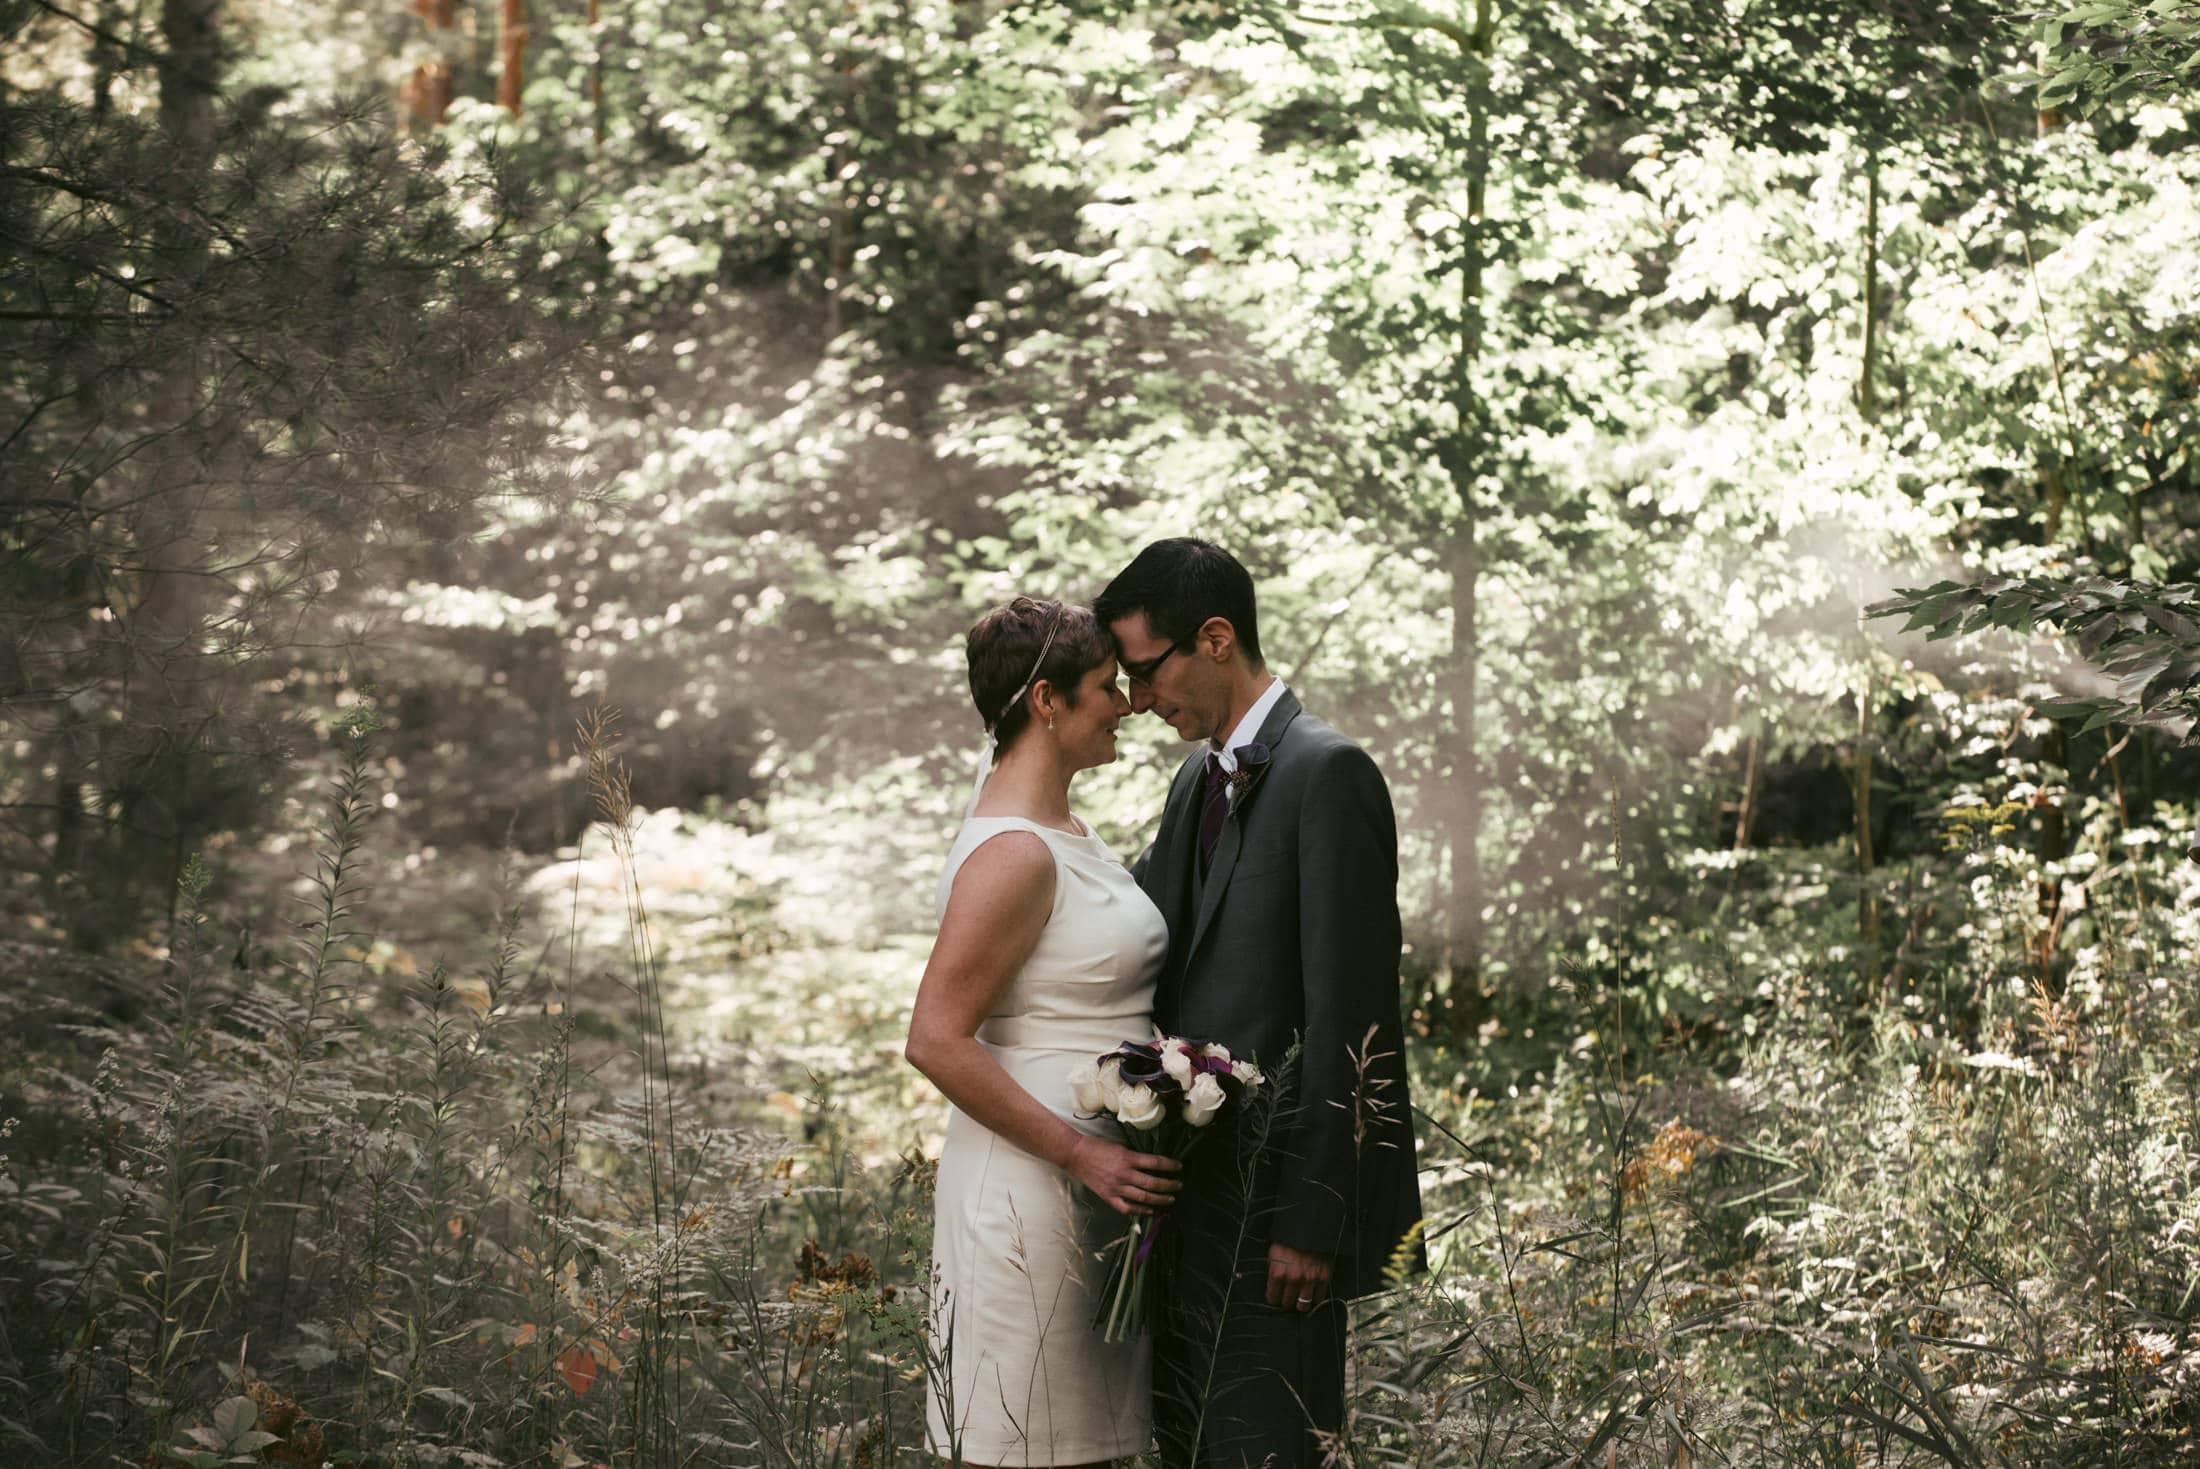 Intimate Wedding Photography Jen HIbberd